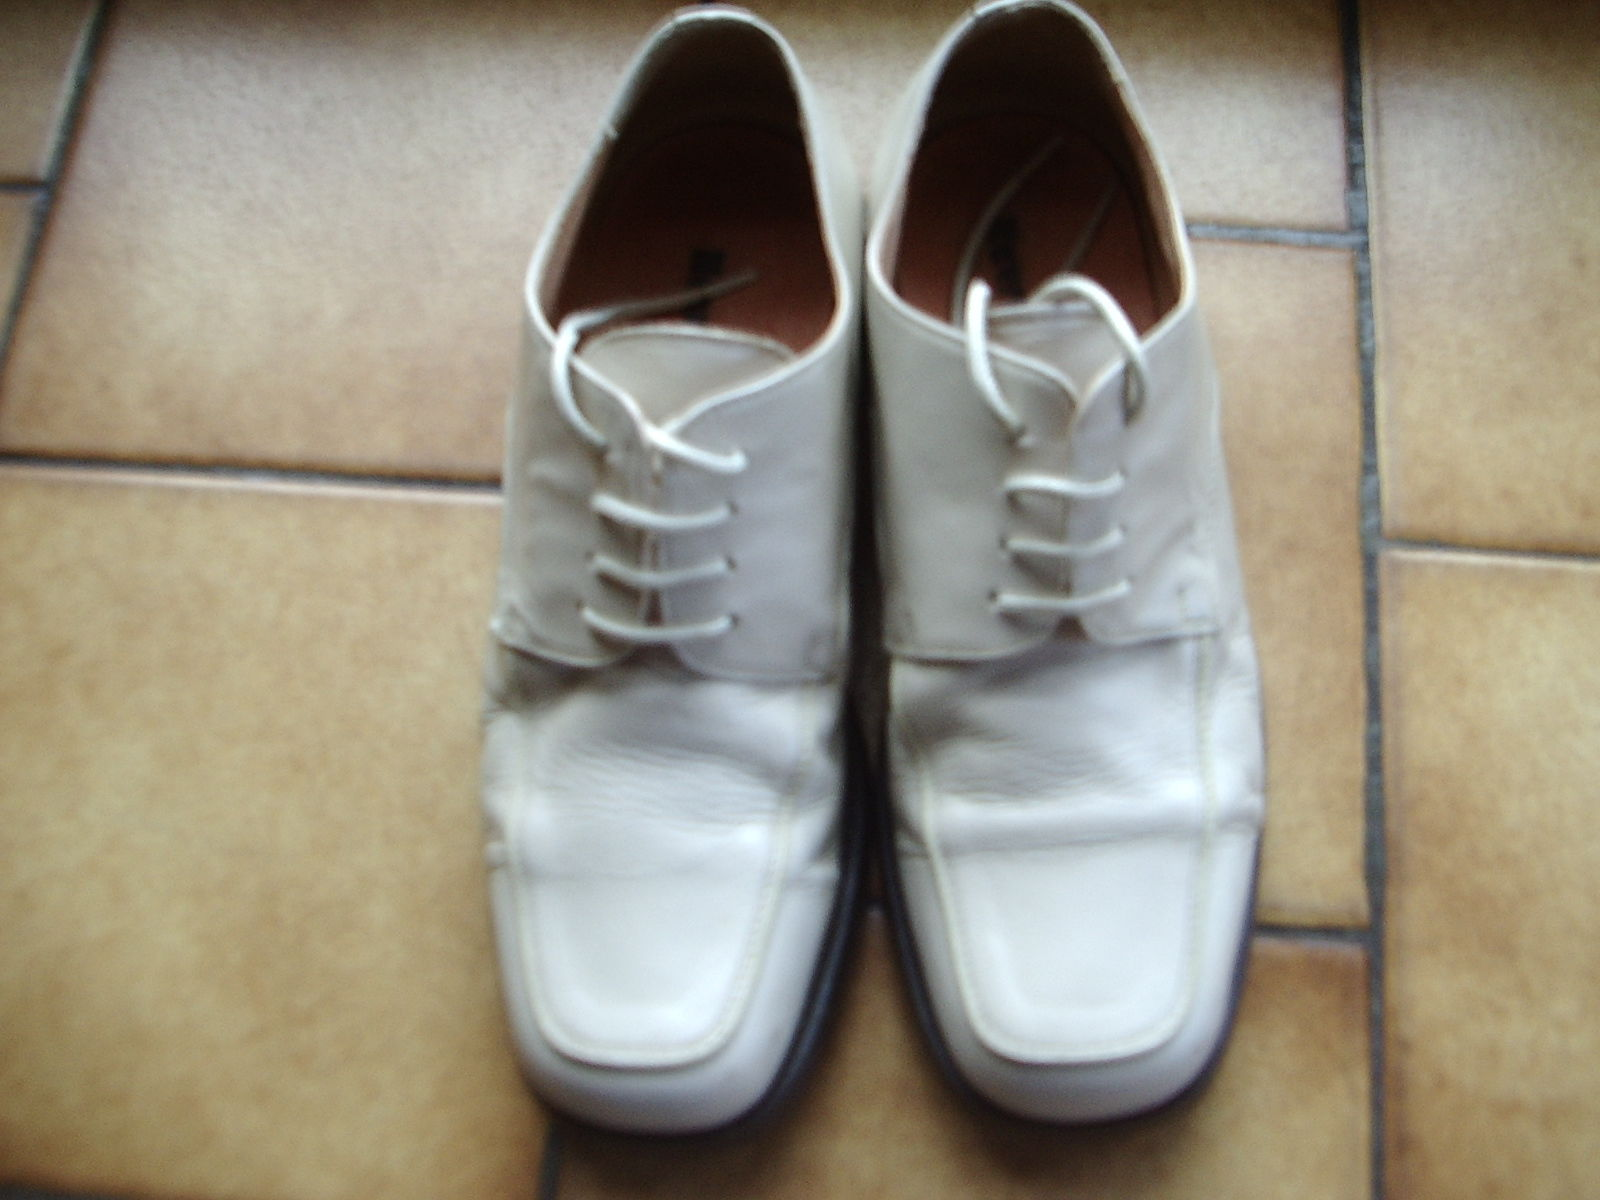 chaussures cuir homme 40 8 Merville (59)